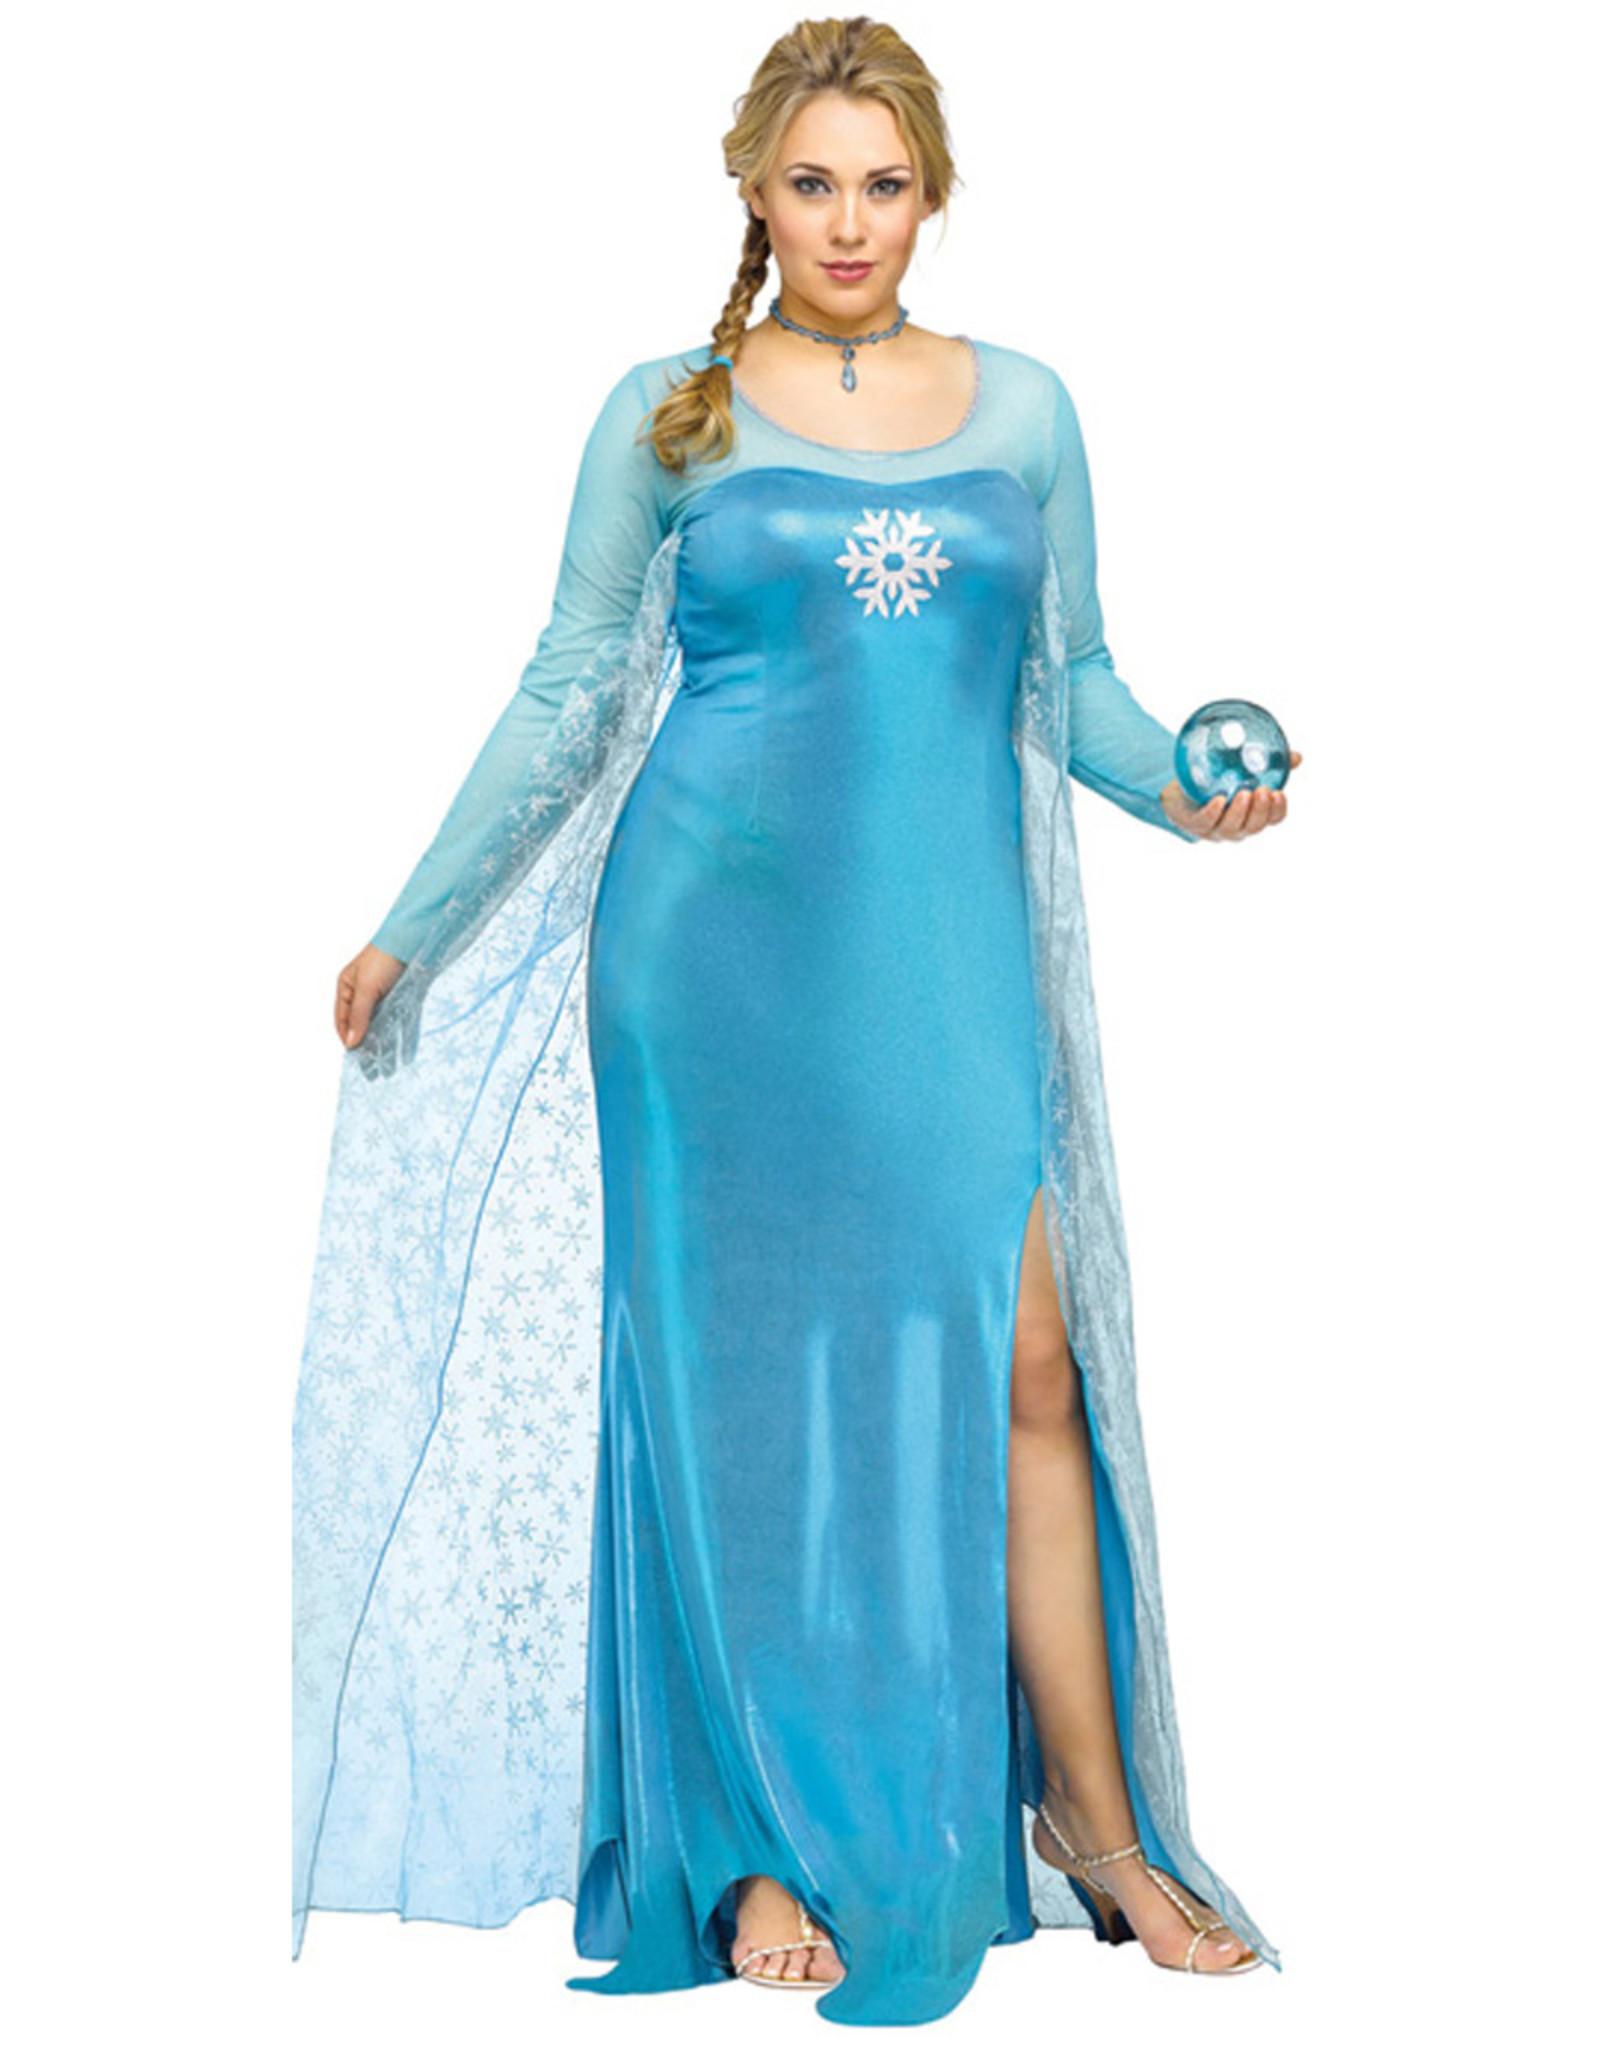 Ice Queen Costume - Women Plus